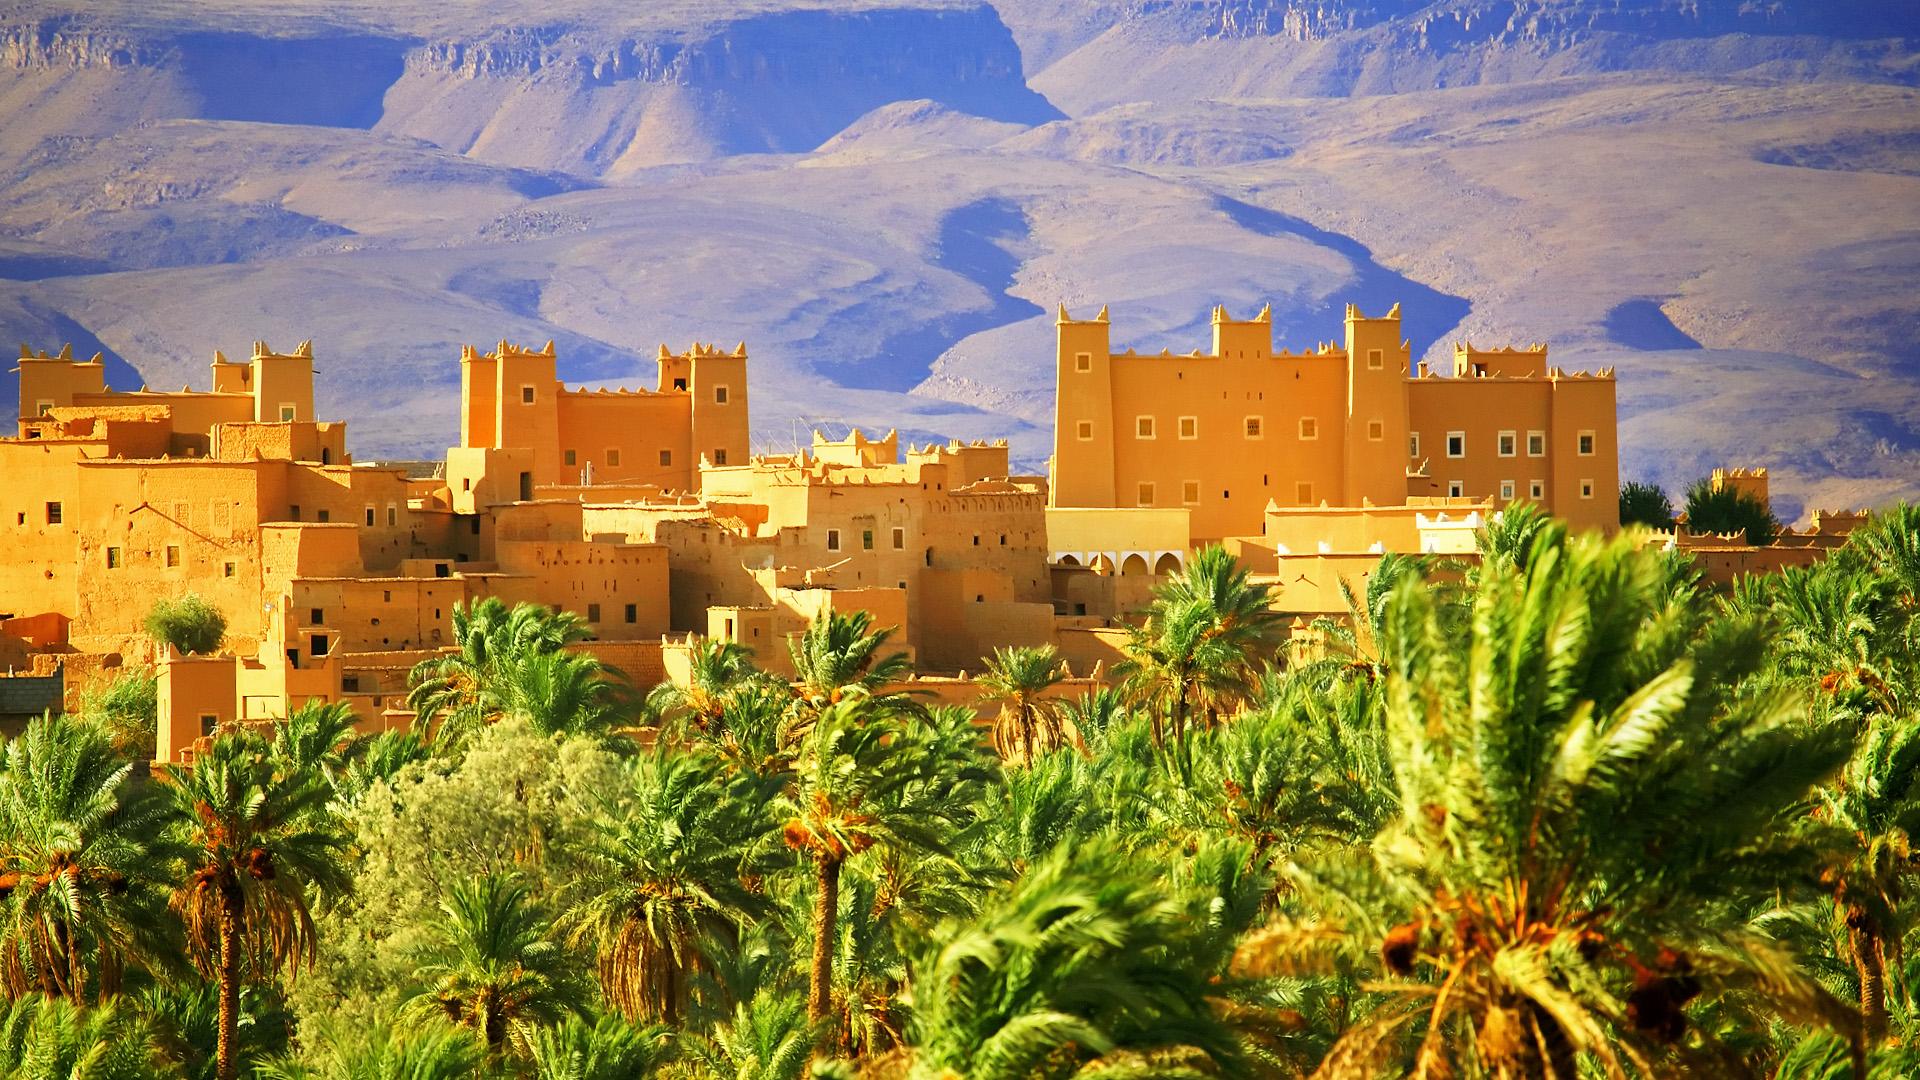 коллаже всего марокко фото работа казан наливаем